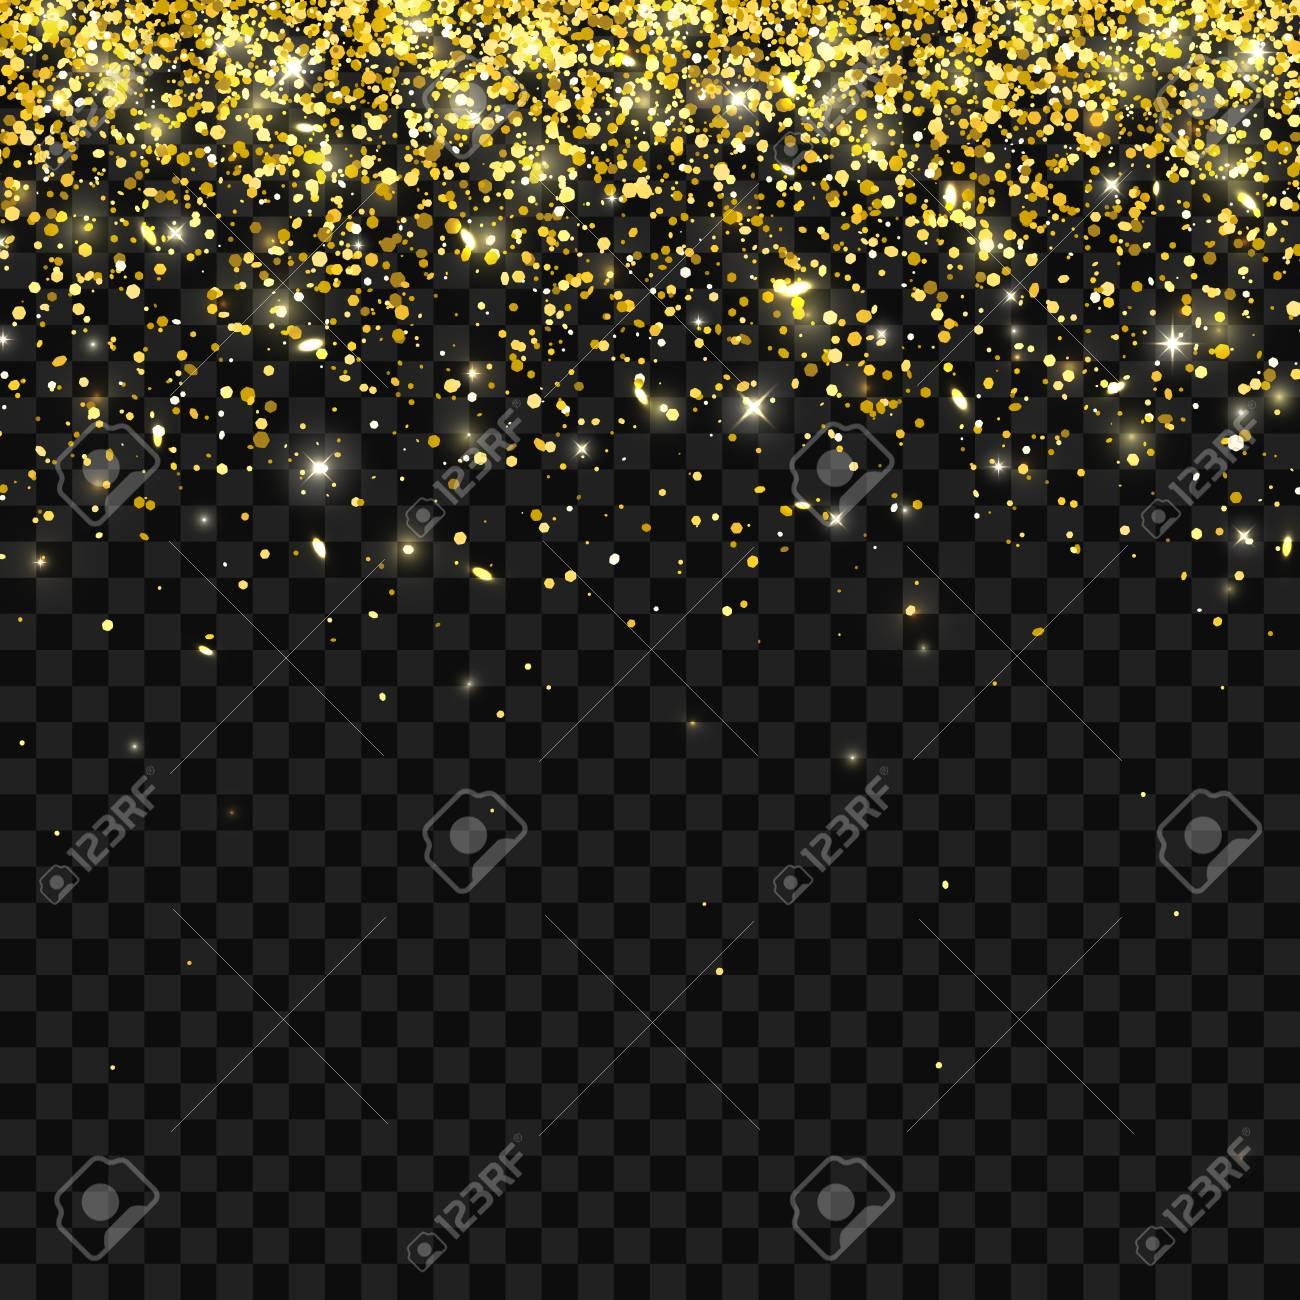 Glitter gold falling best photo